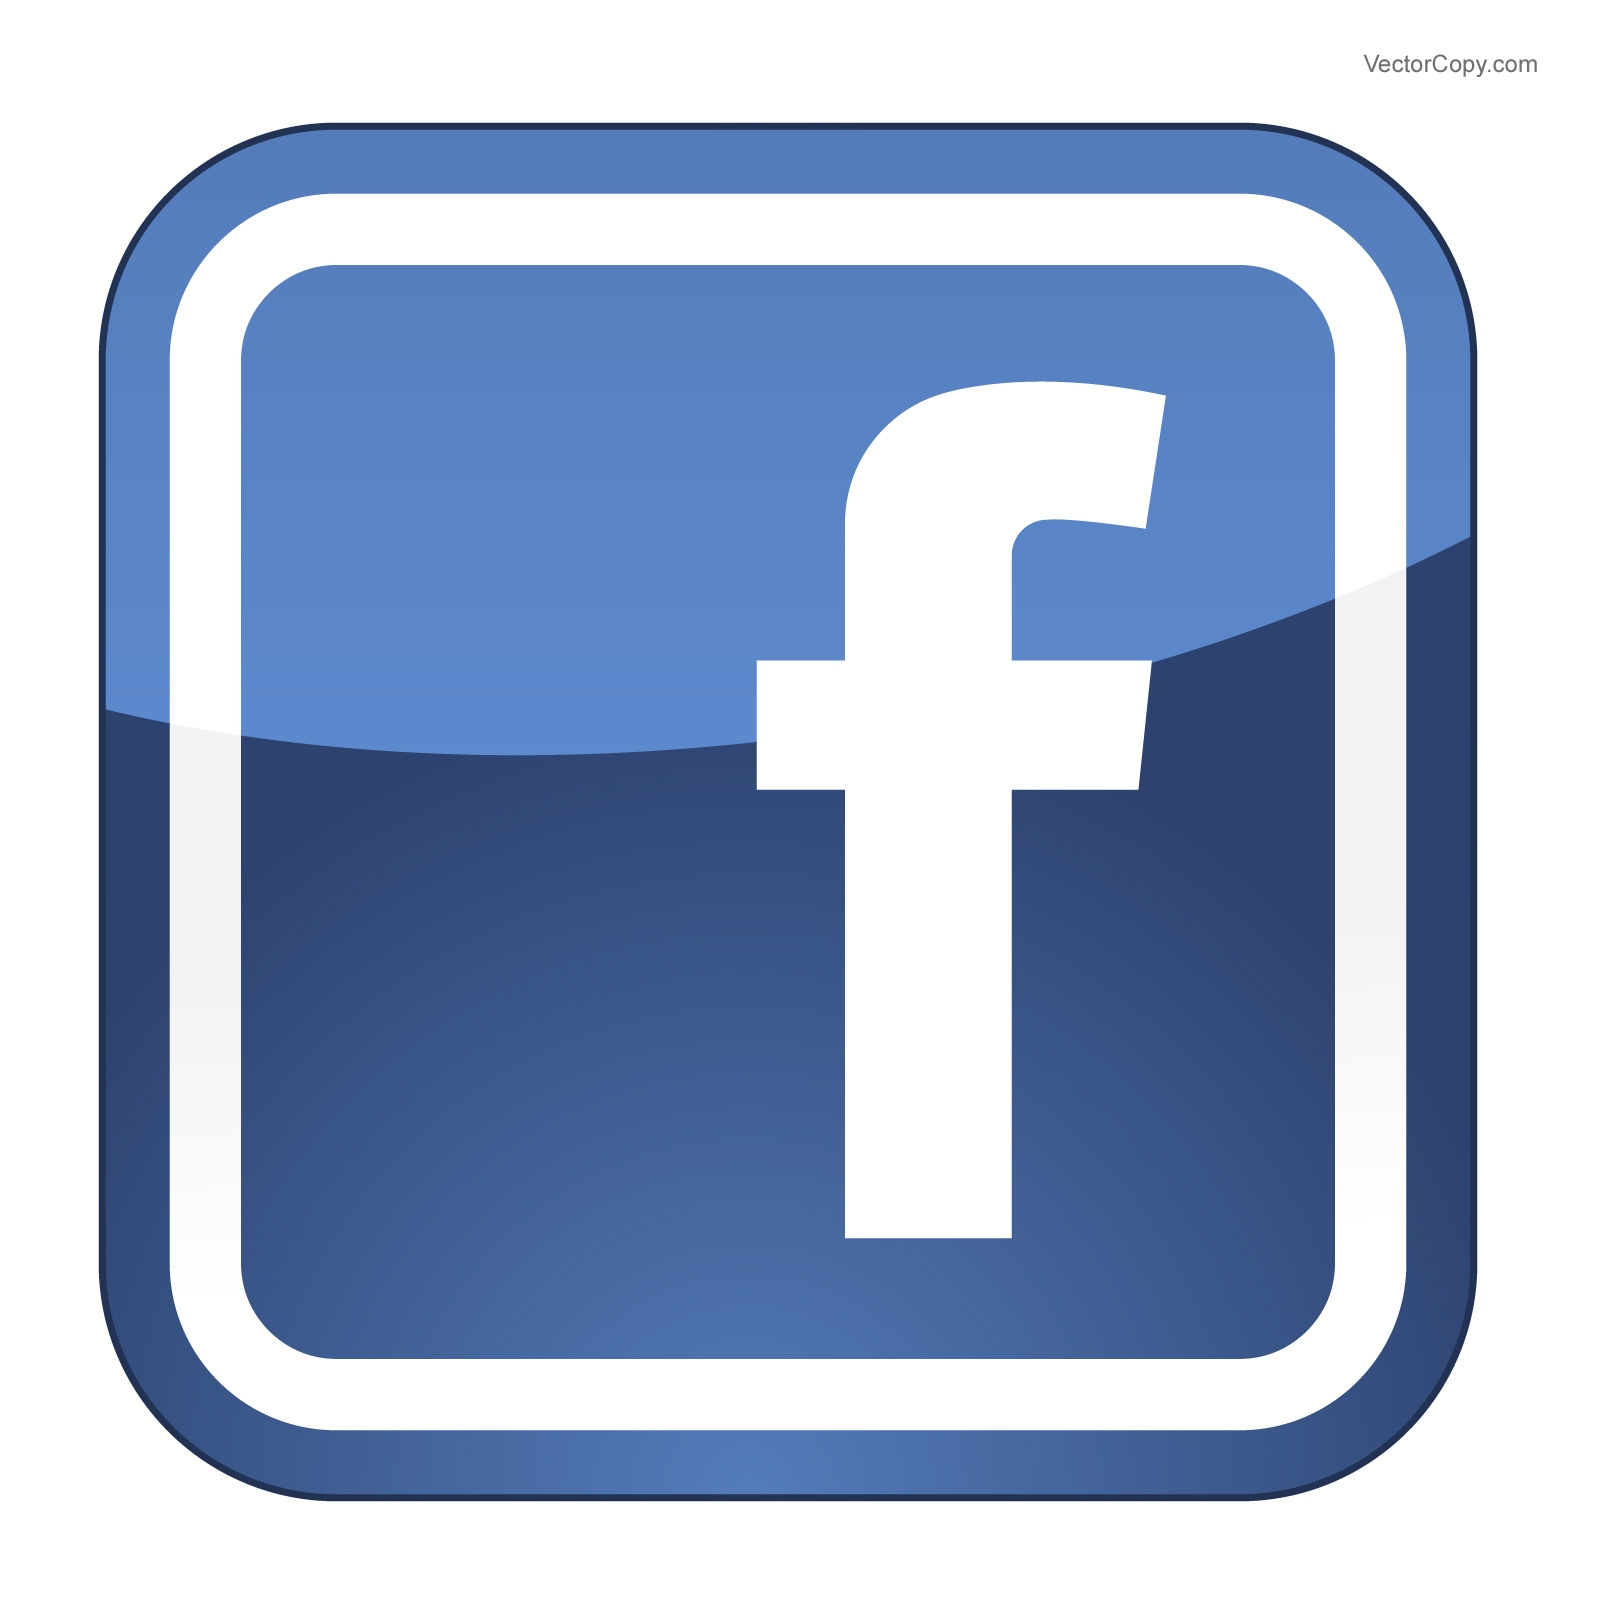 Facebook Clipart - 17 - E - Clipart Free-facebook clipart - 17 - e - Clipart Free Download Clip Art Free Clip Art-12